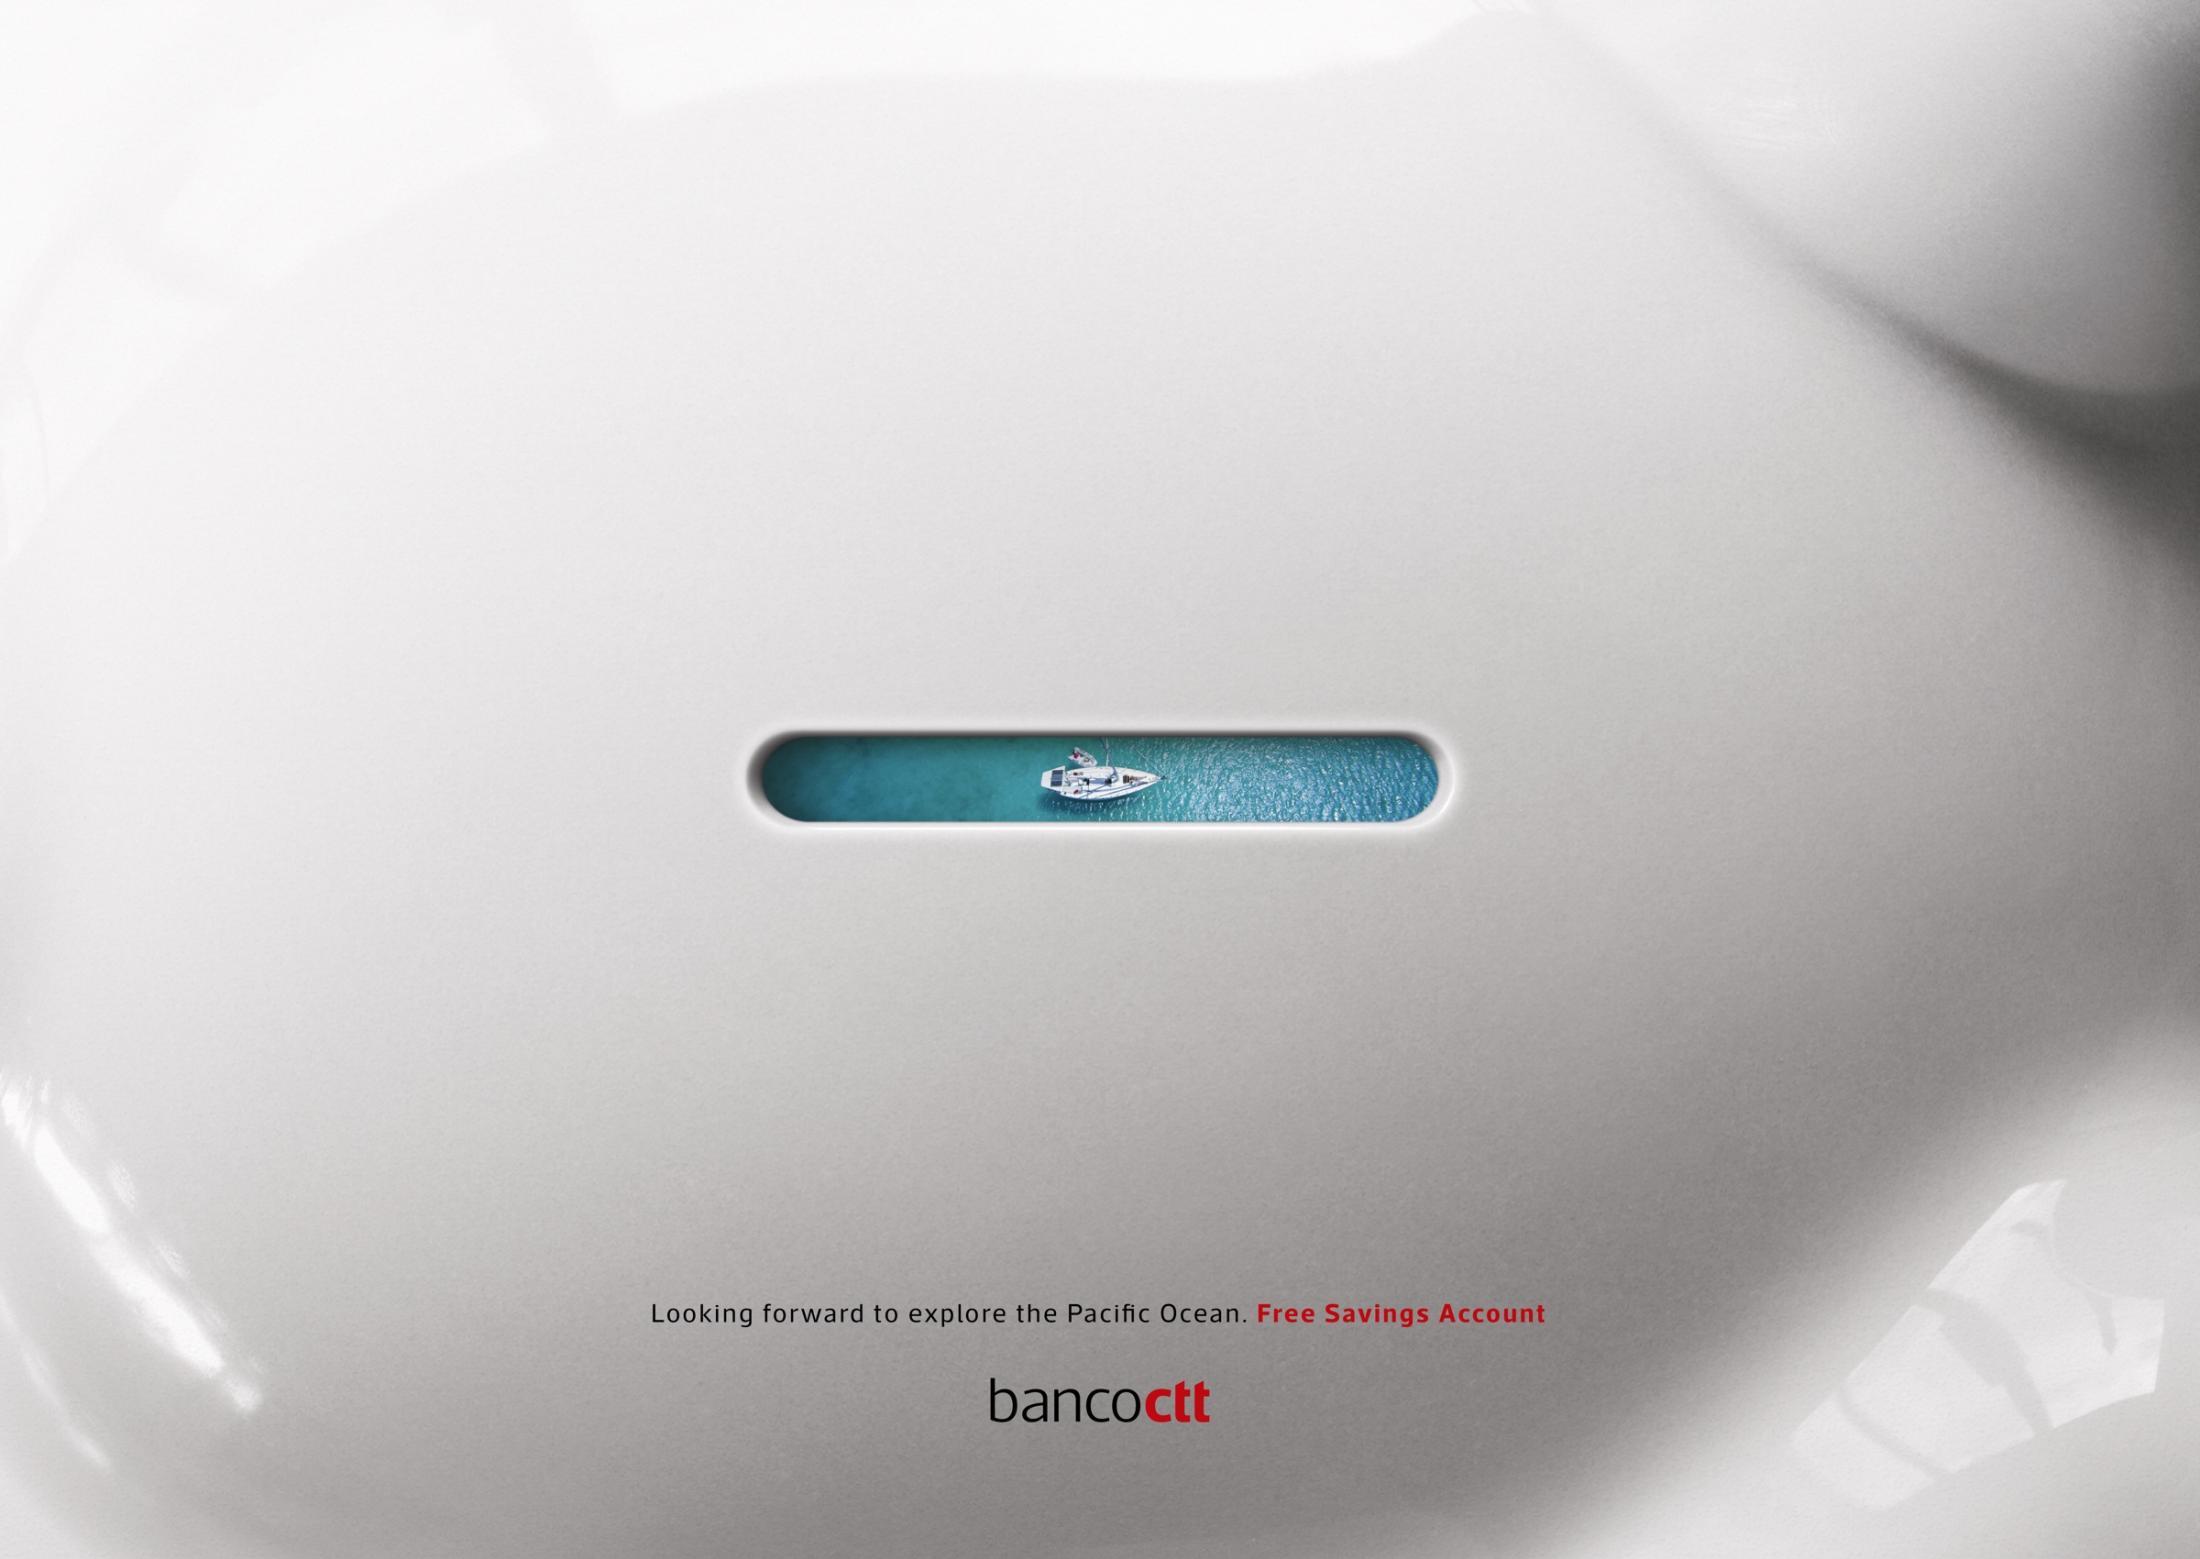 Banco CTT Print Ad - Through the Piggy Hole - Boat